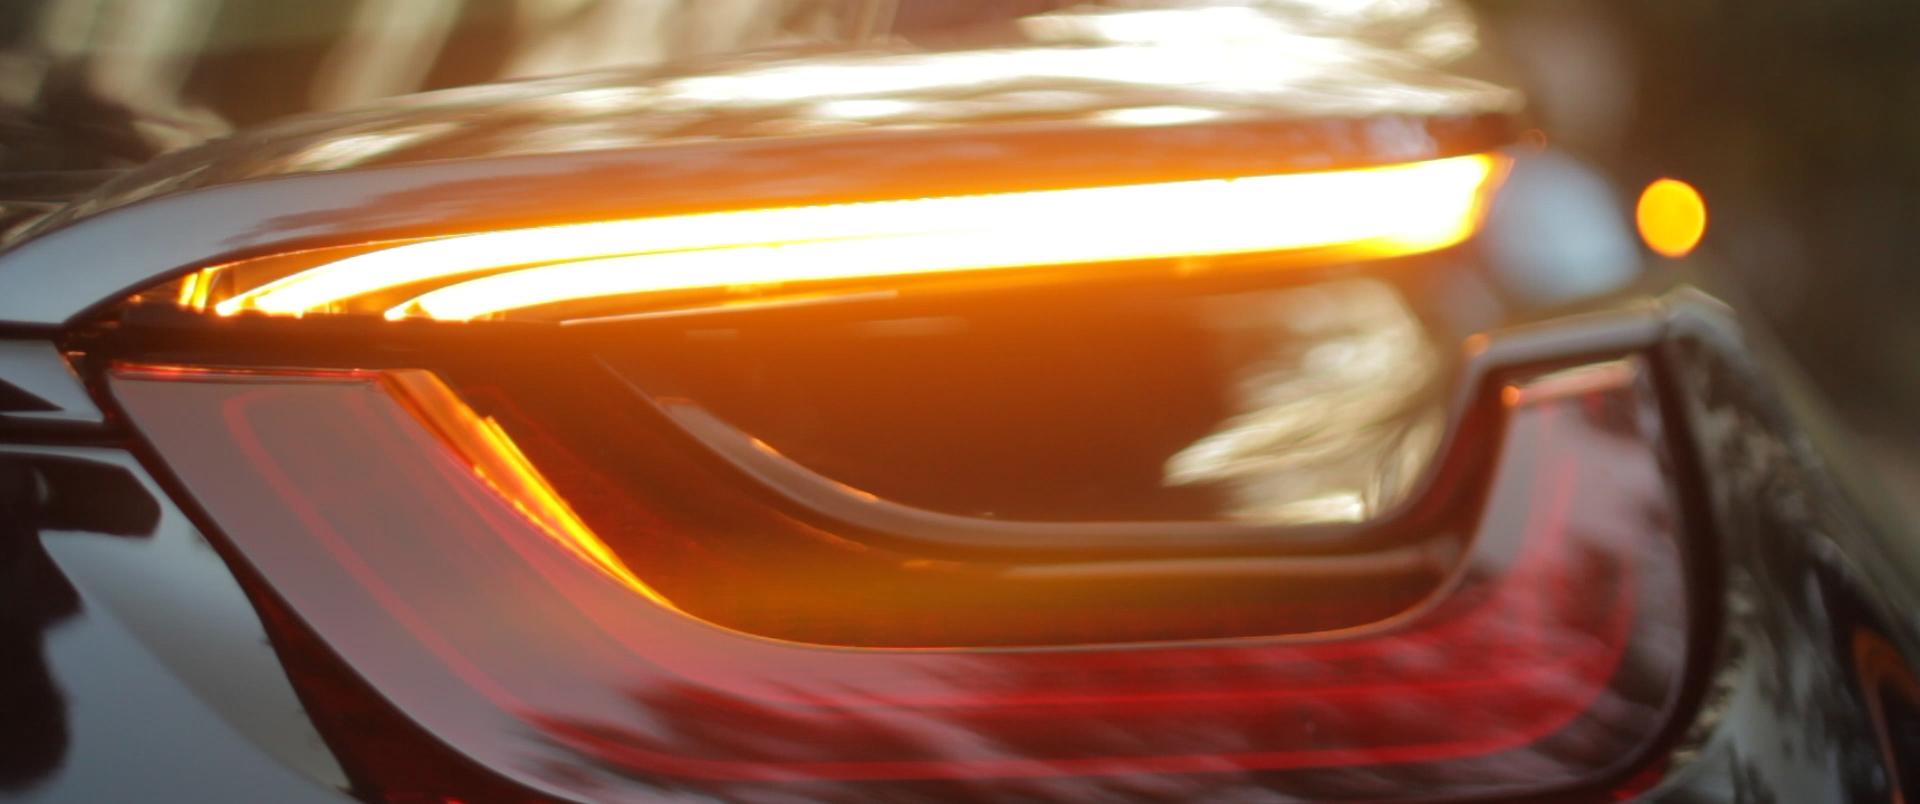 BMW i8 18.jpg